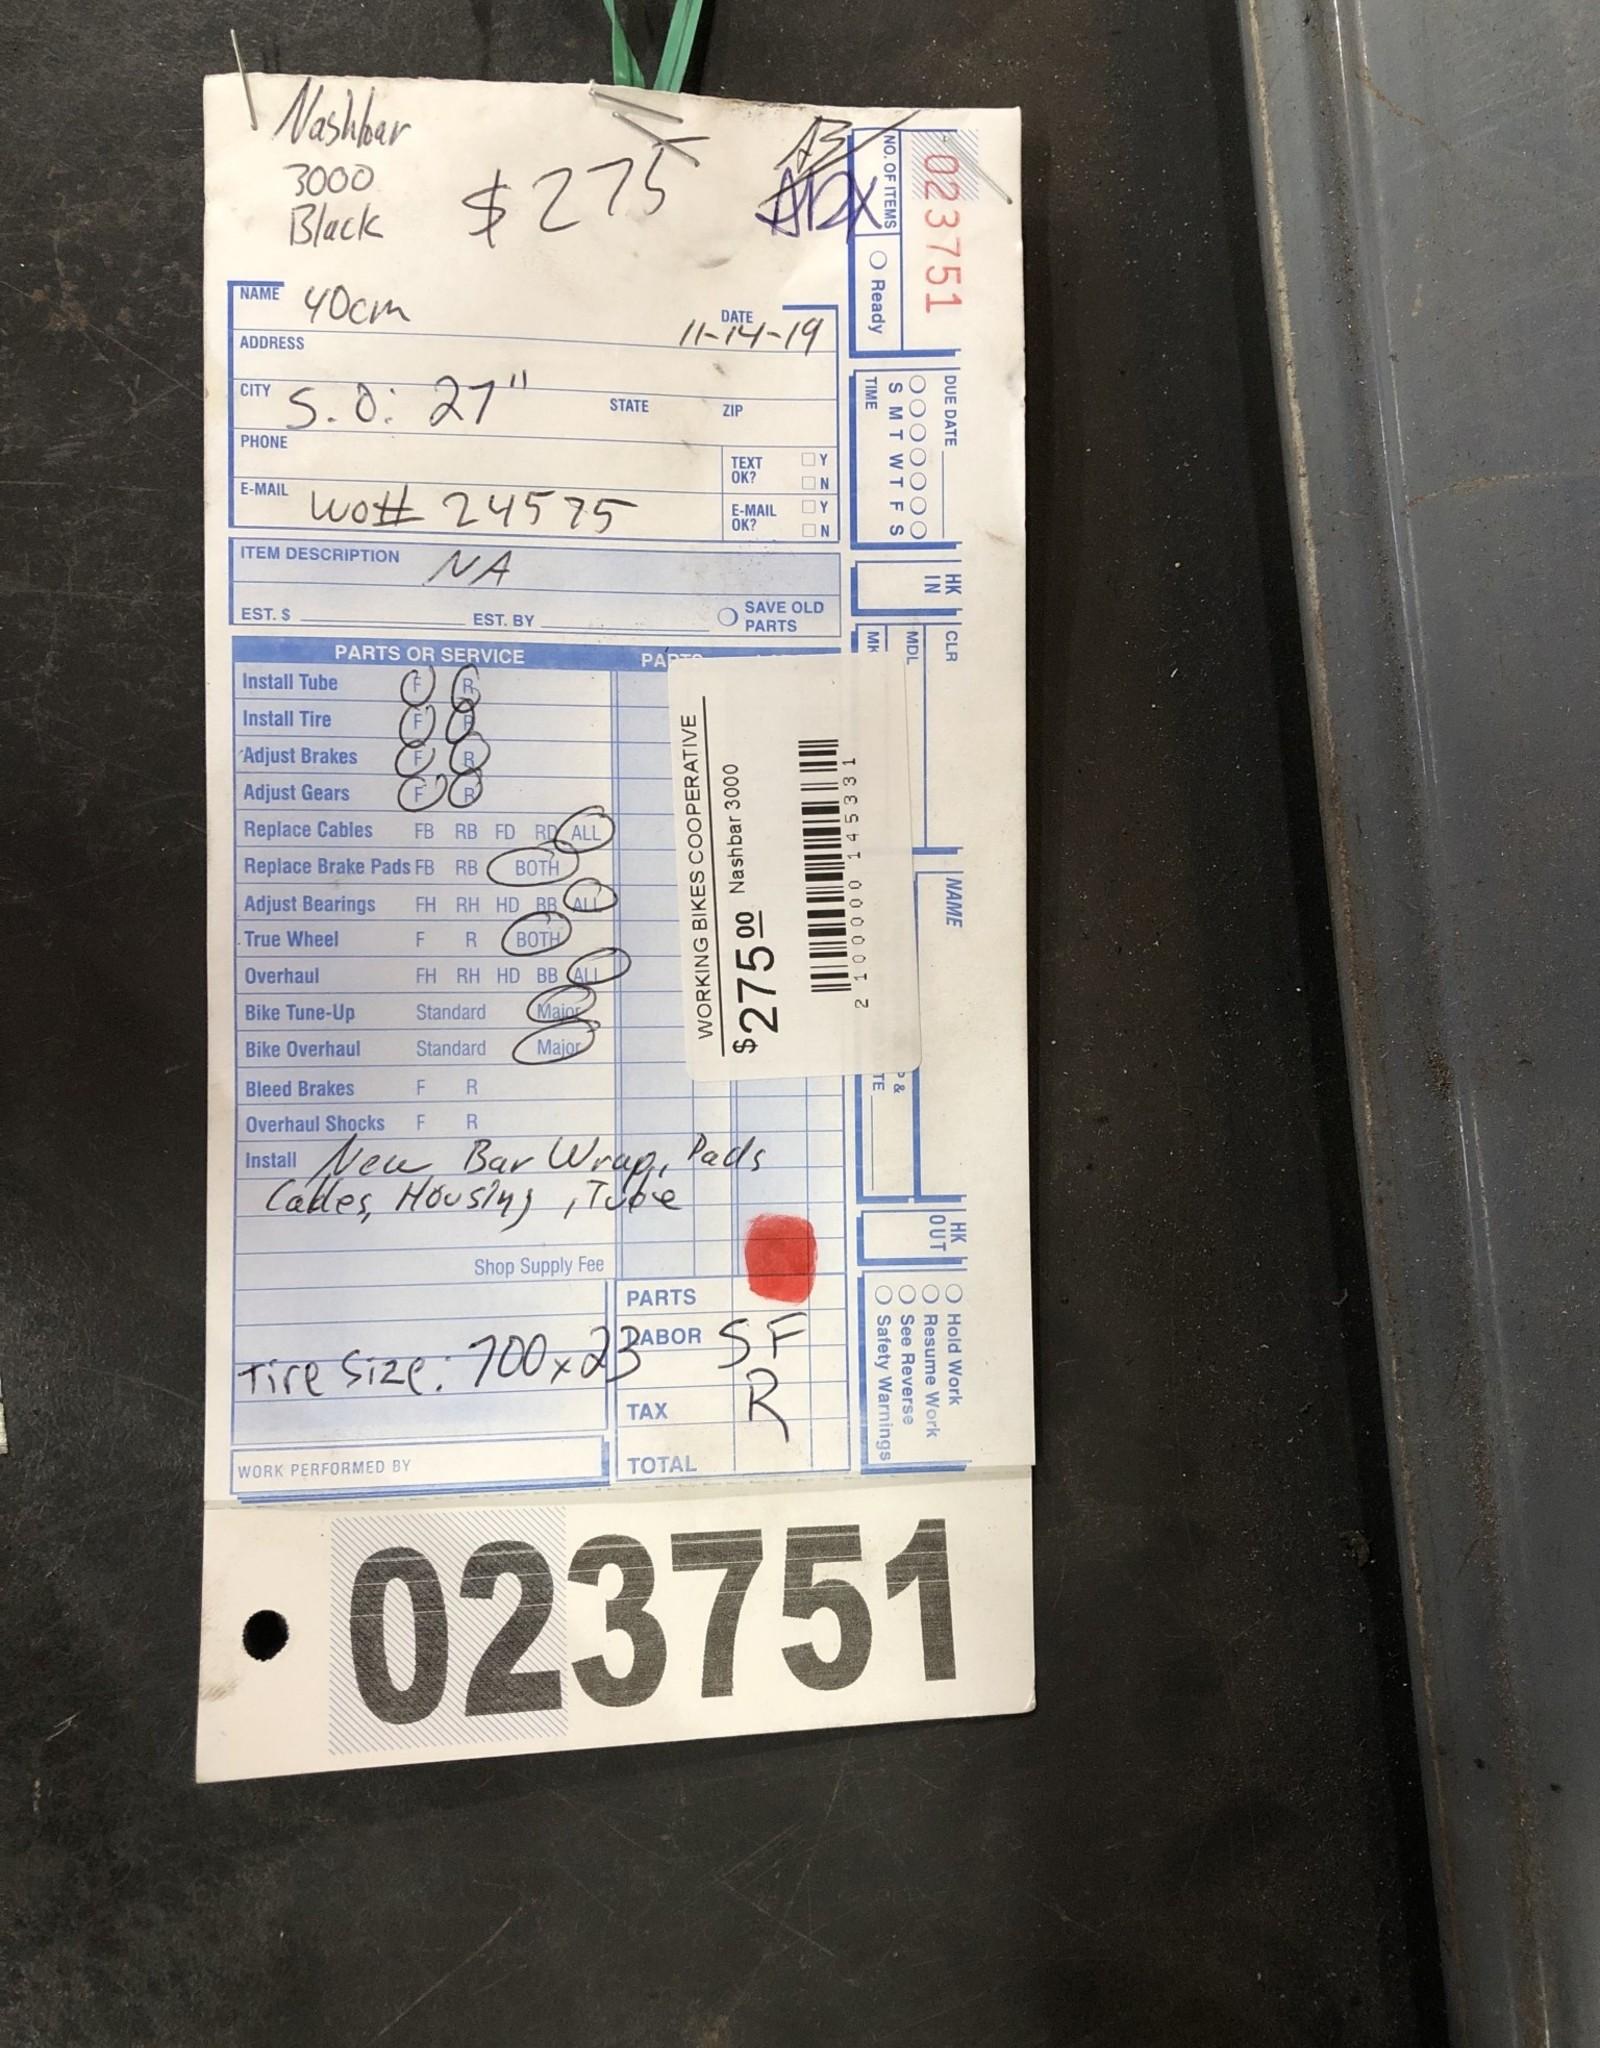 40cm Nashbar 3000 (N/A, sfr)